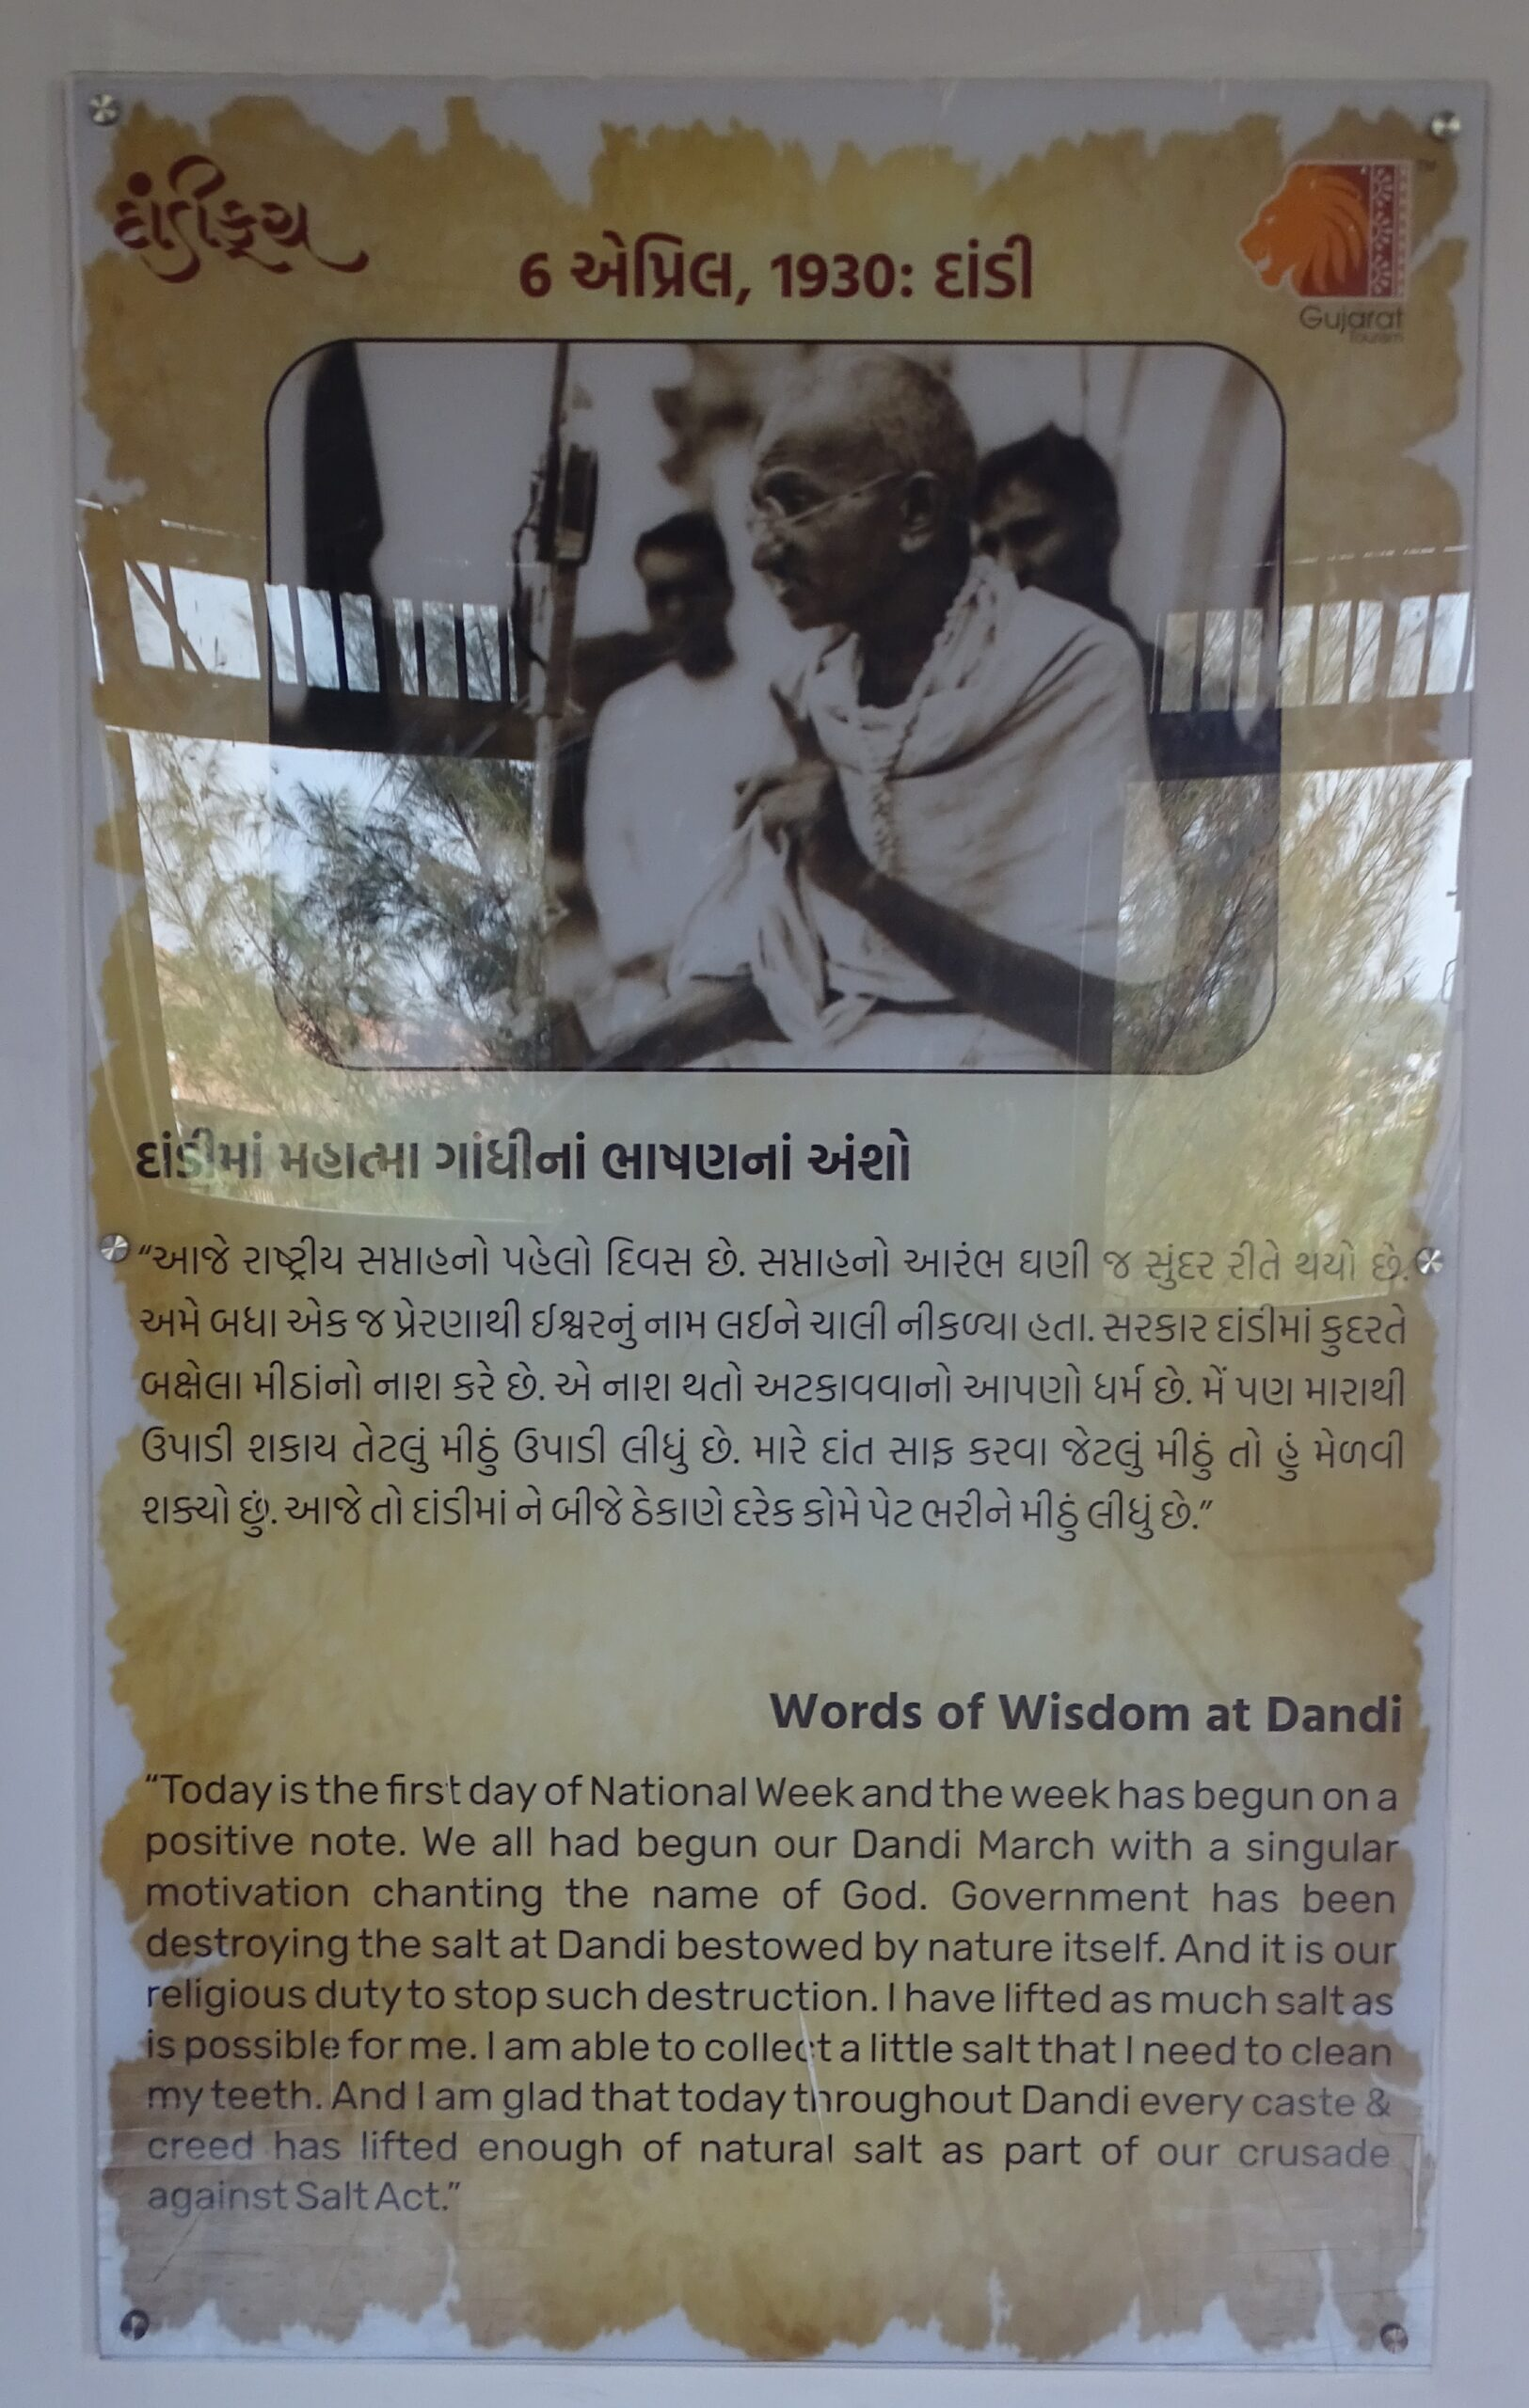 6 April, 1930 - Words of Wisdom by M. K. Gandhi at Dandi, Gujarat